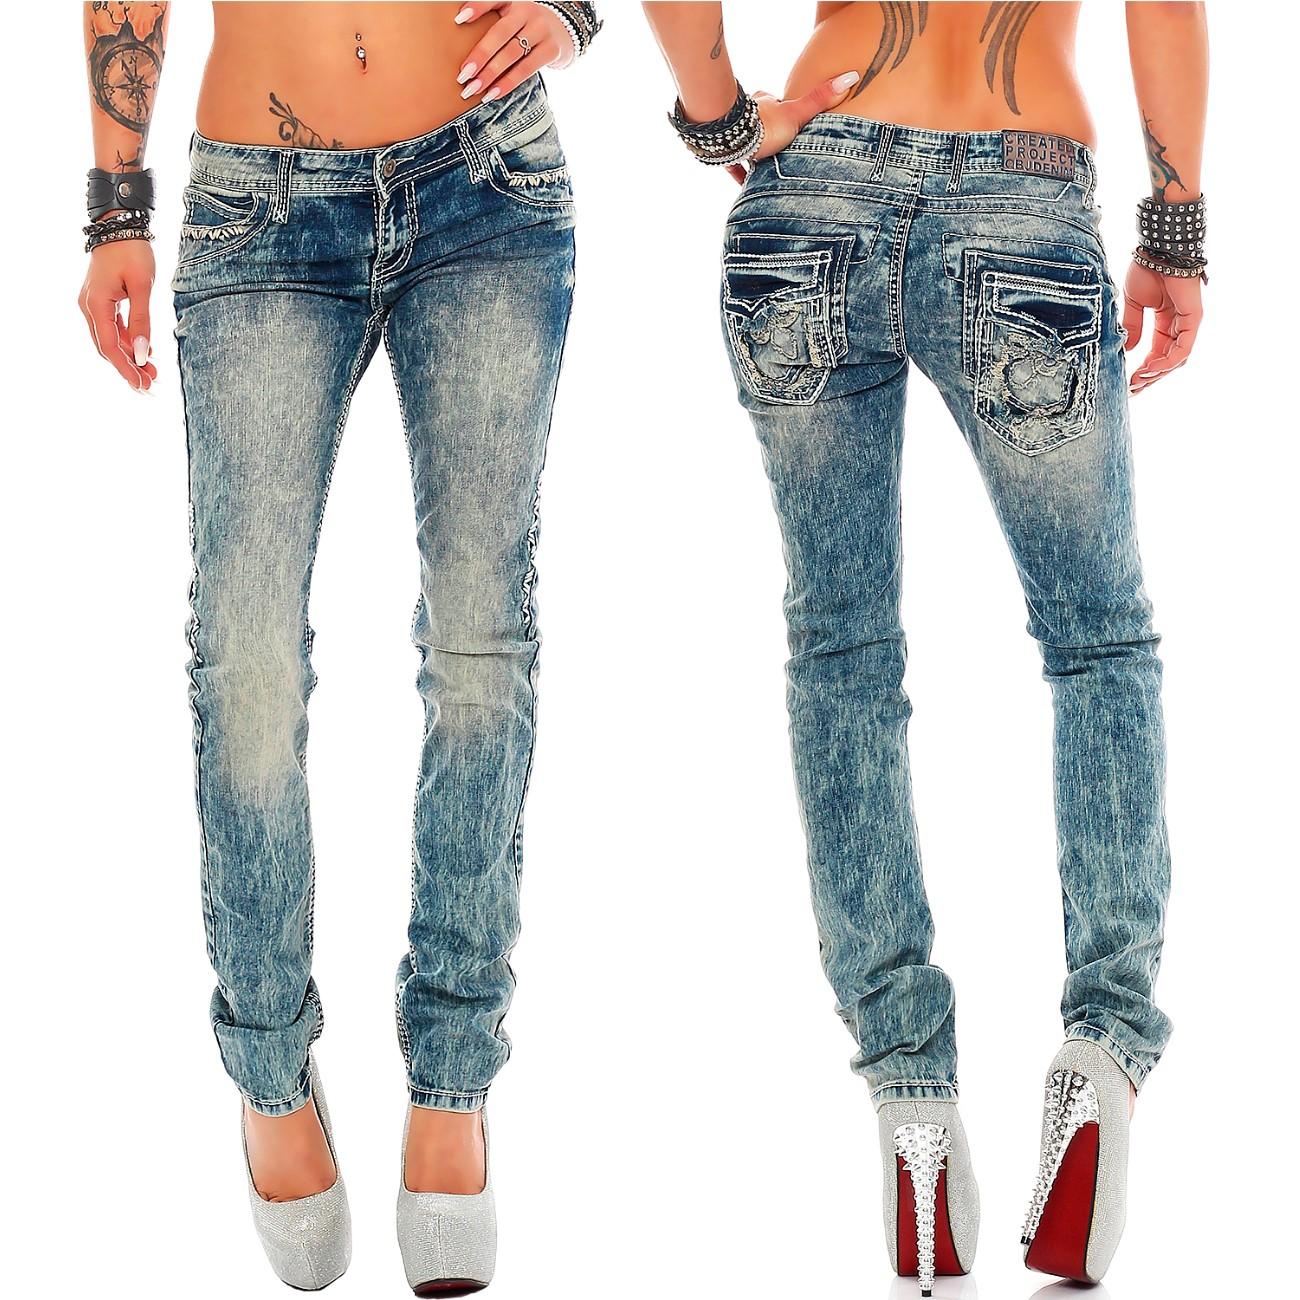 cipo baxx sexy damen jeans hose slim straight skiny cut. Black Bedroom Furniture Sets. Home Design Ideas